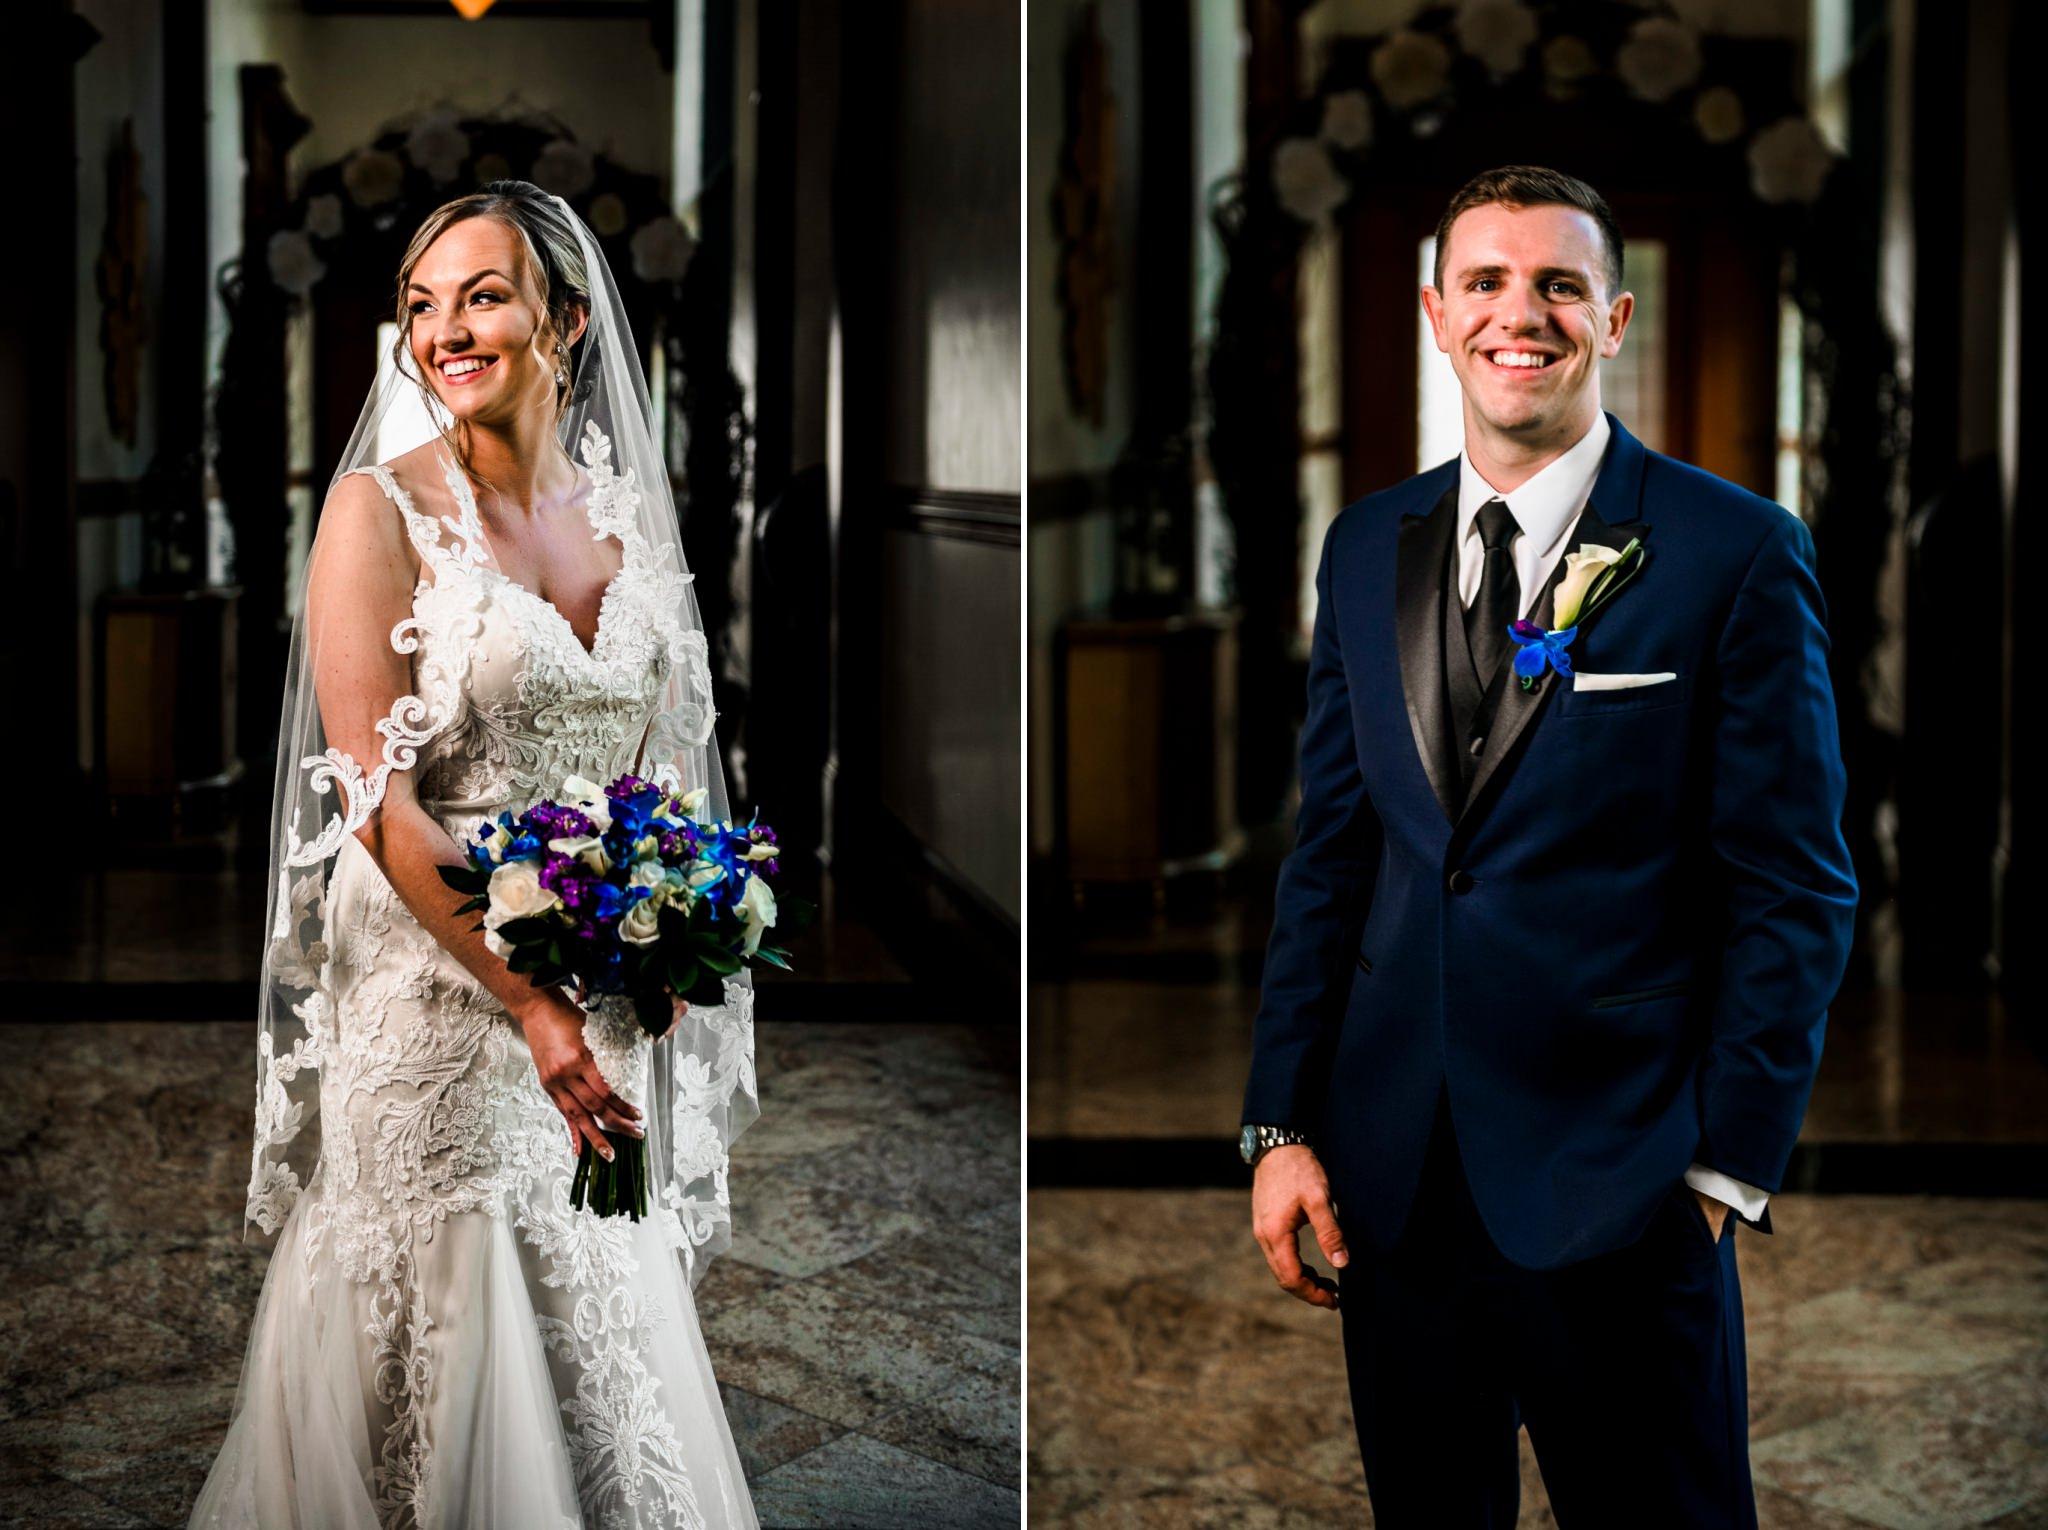 Brennan-South-Gate-Manor-New-Jersey-Wedding-Photographer-56.JPG